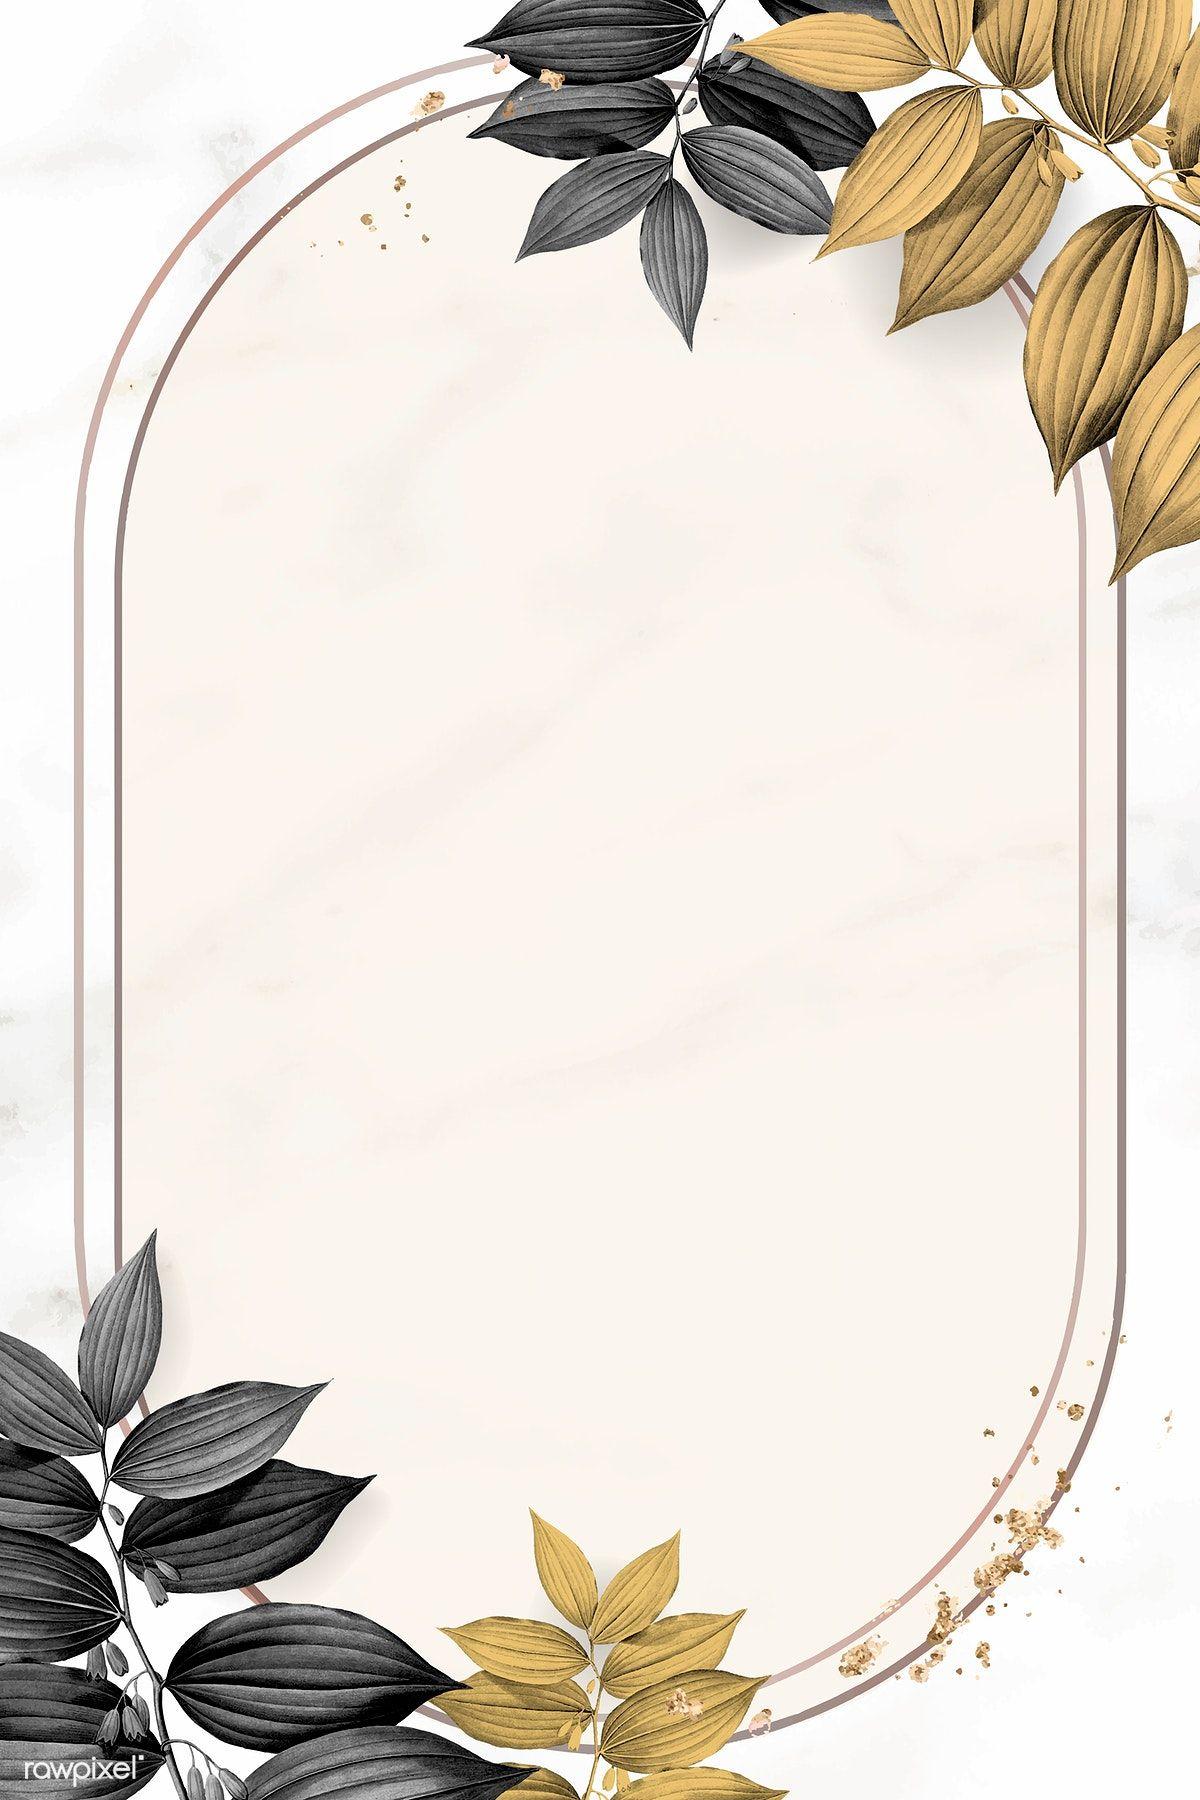 Download Premium Vector Of Gold Frame With Foliage Pattern On Marble Bunga Cat Air Kartu Pernikahan Bingkai Foto